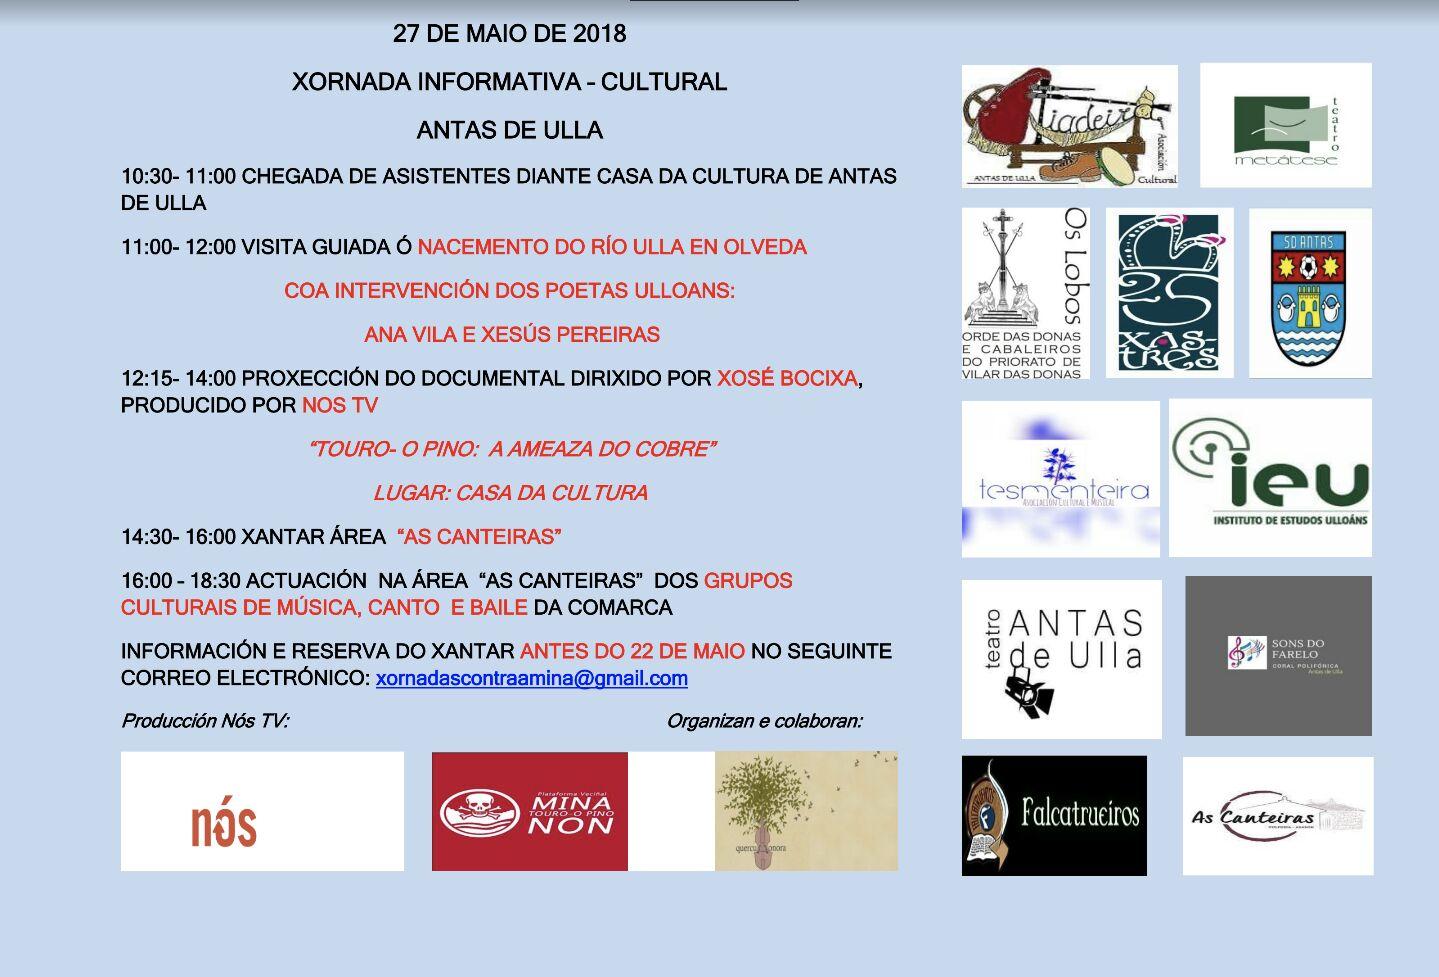 xornada informativa cultural Mina Touro 27-5-2018, Instituto de Estudos Ulloáns, IEU